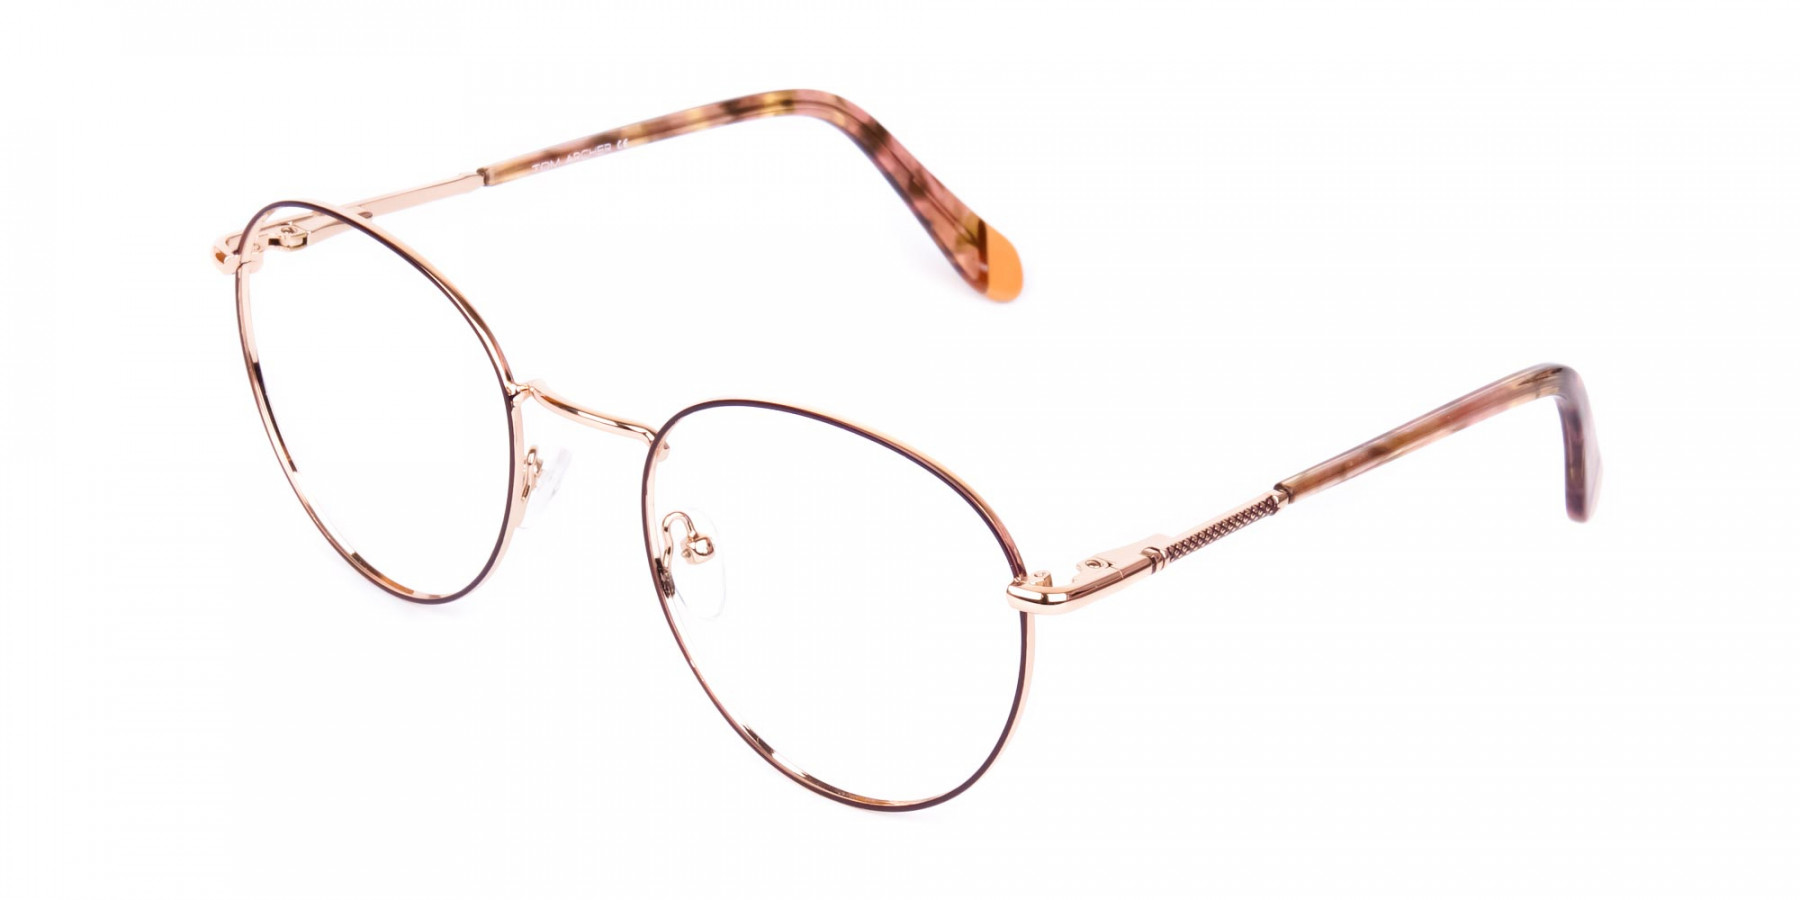 teashade prescription glasses-1